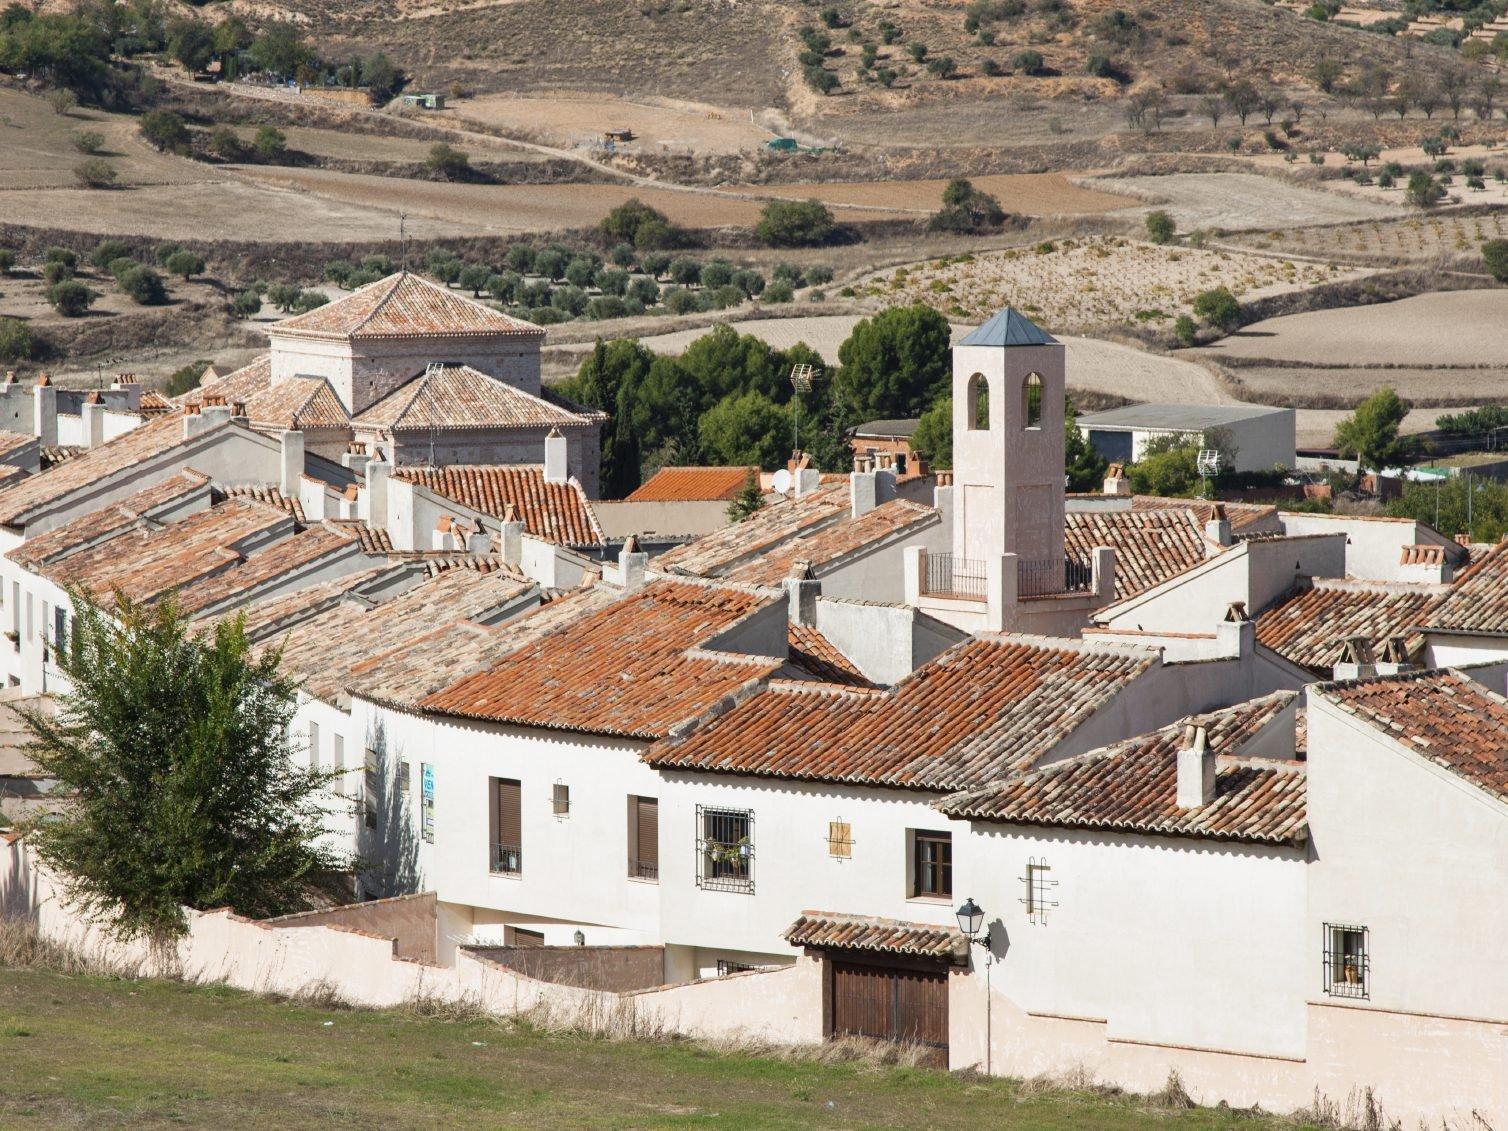 En Espagne, Chinchón, ville historique.